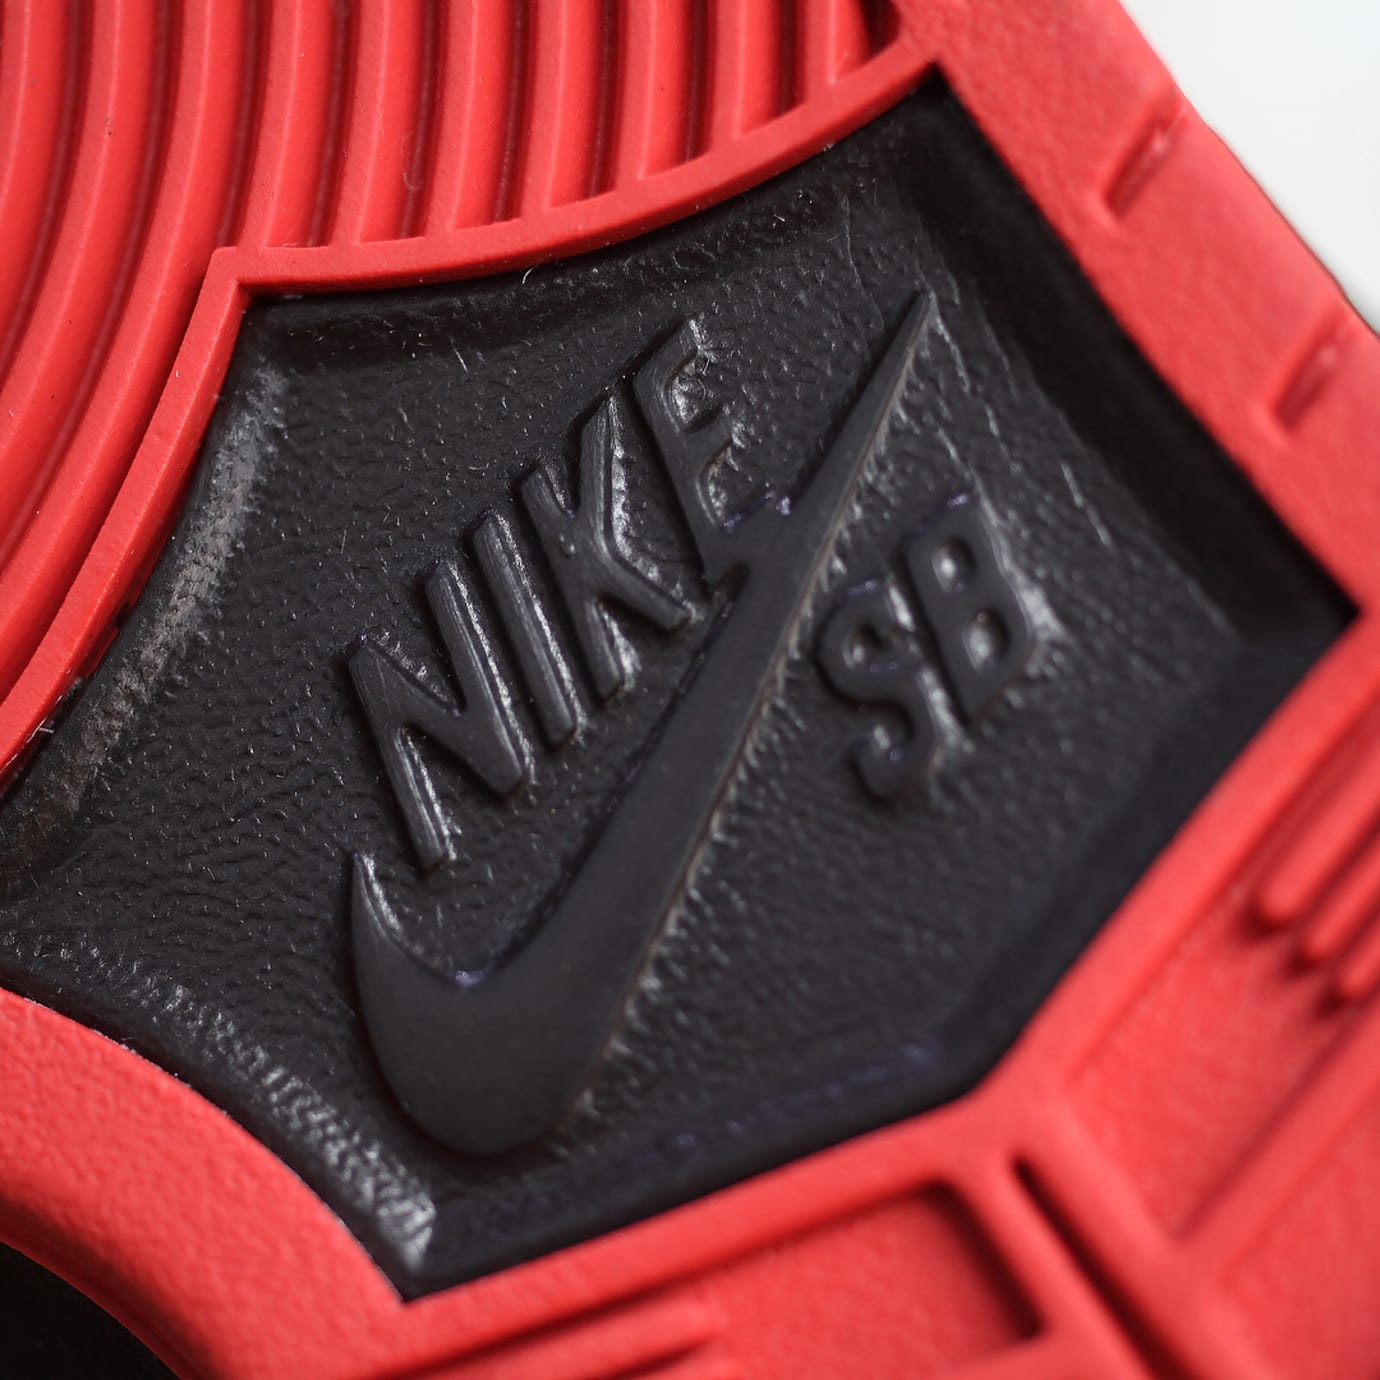 Nike SB Dunk Low Black Pigeon Release Date 88323-008 (14)